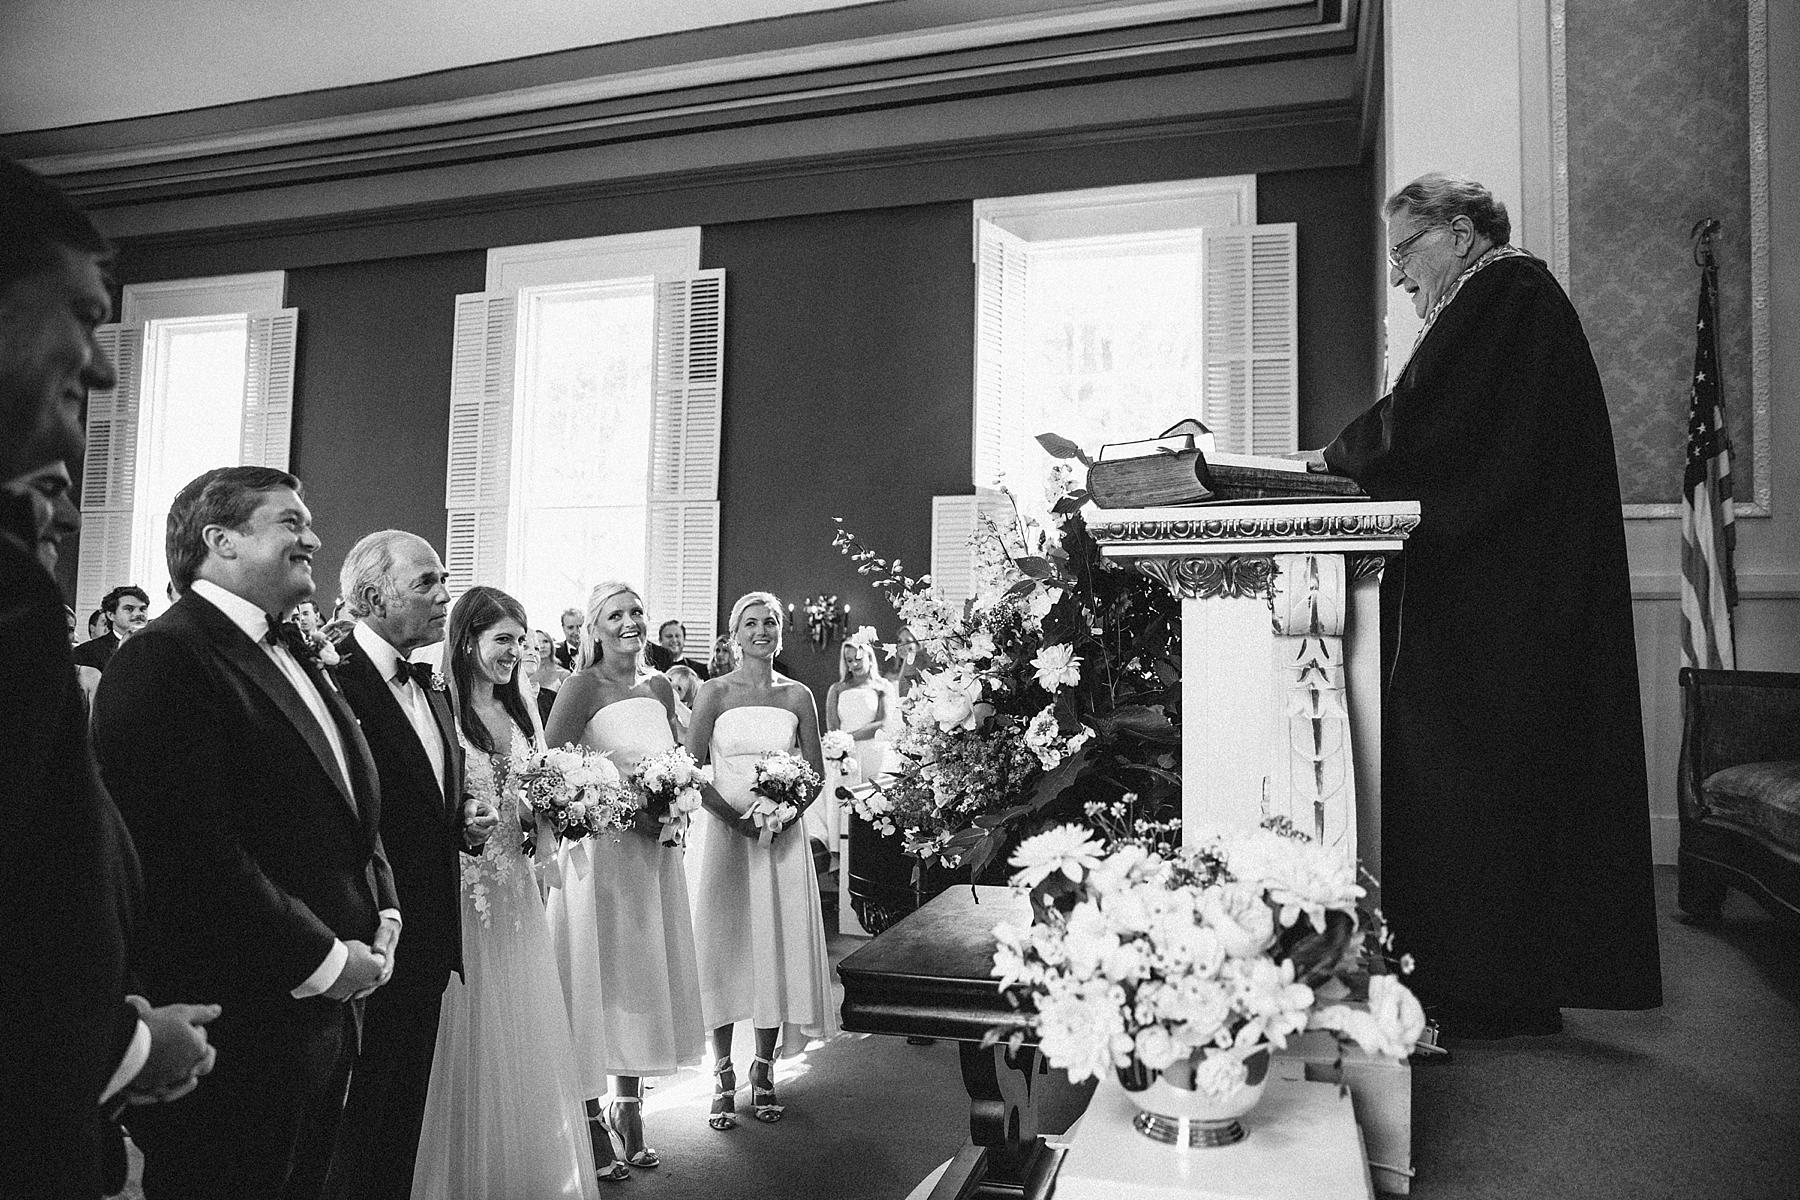 mashomack-preserve-polo-club-wedding-ny-photographer_0043.jpg